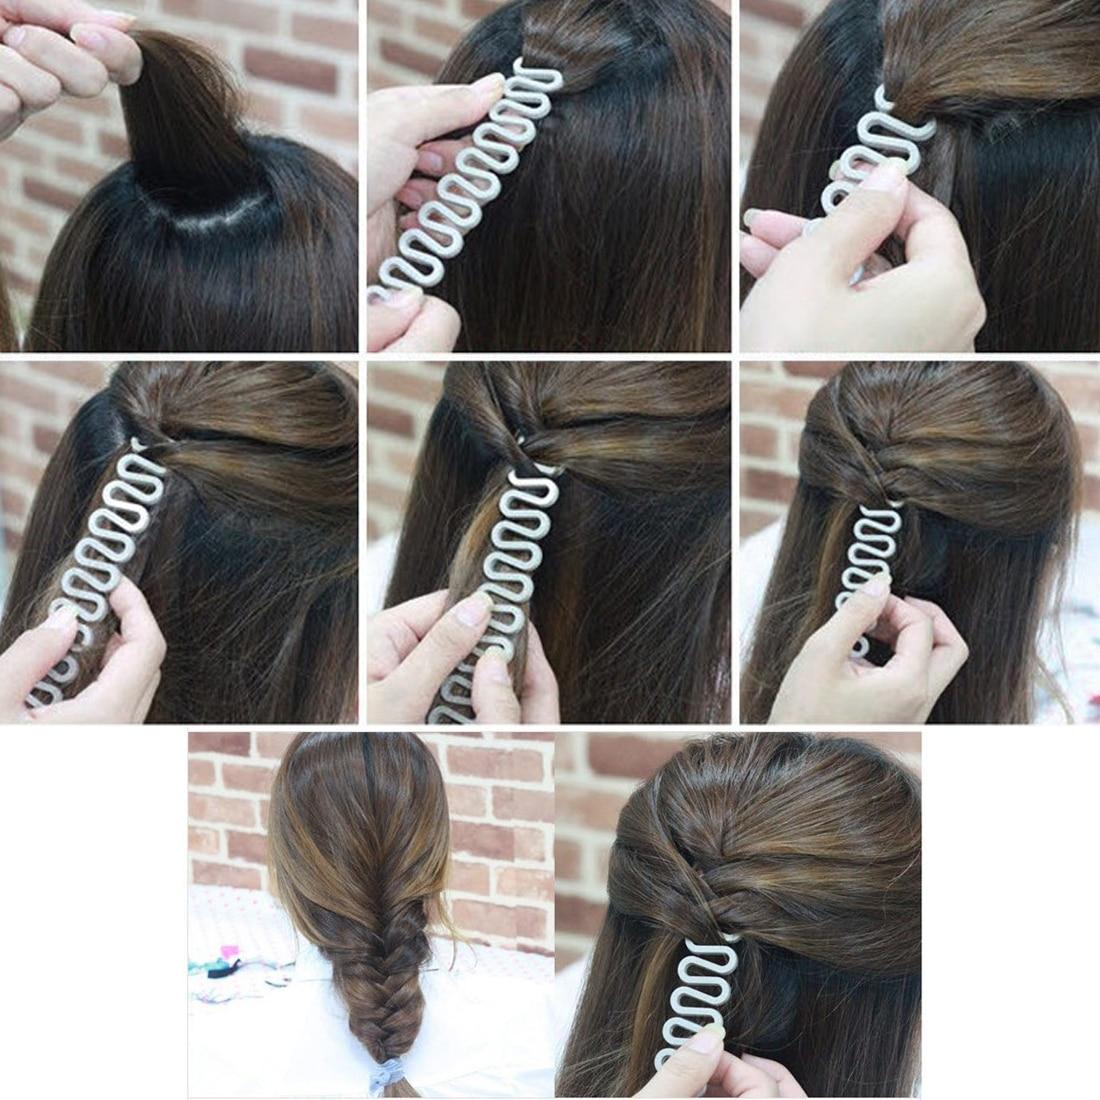 Diferent Sizes Hair Braiding Tool Fish Bone Braider Roller Twist Styling Bun Maker Weave Roller Band Hair Styling Hairdressing